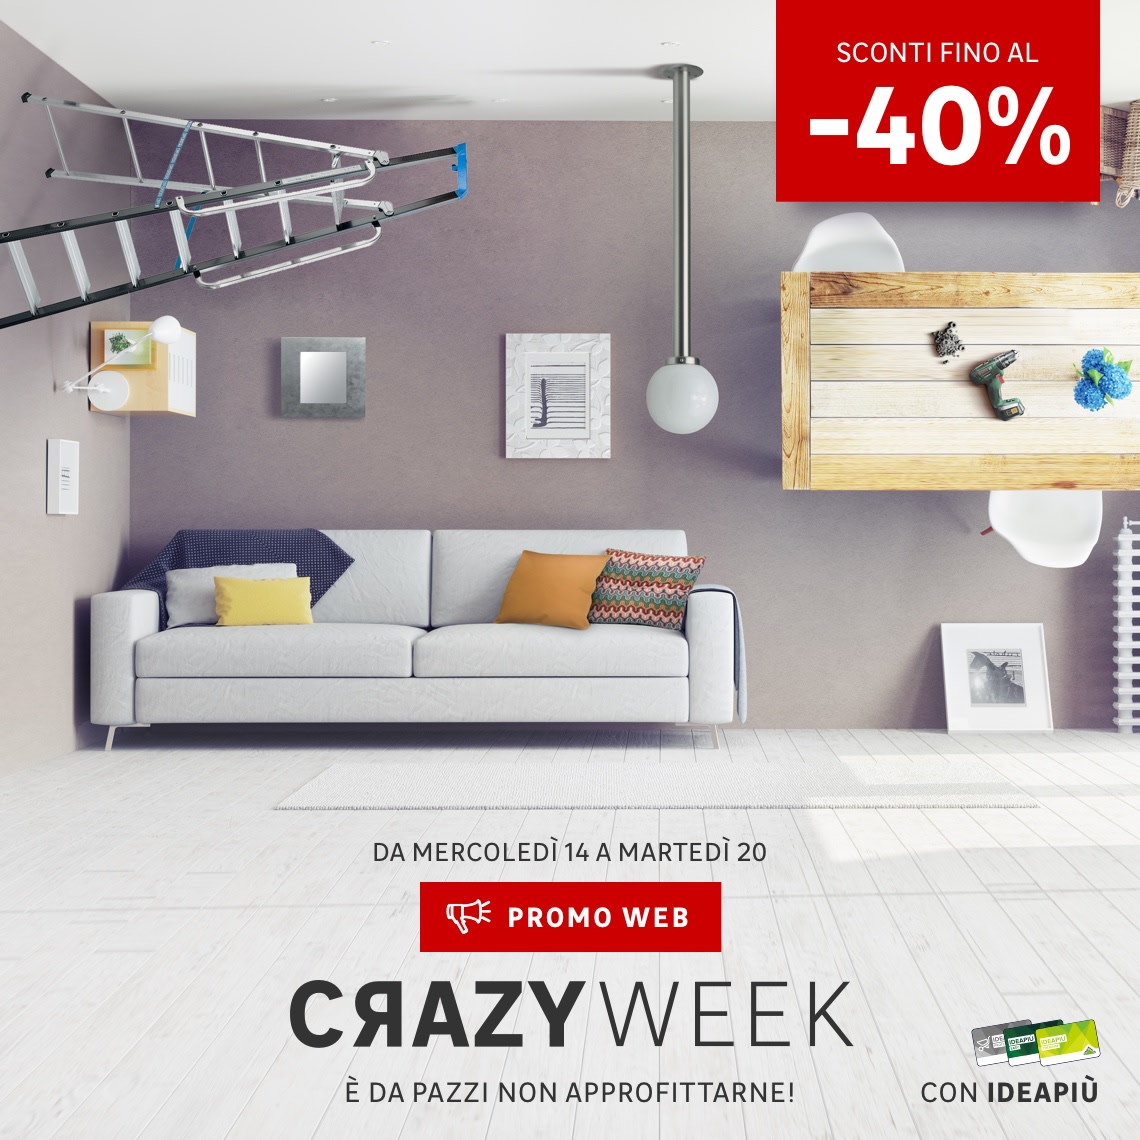 Promoweb Crazy Week